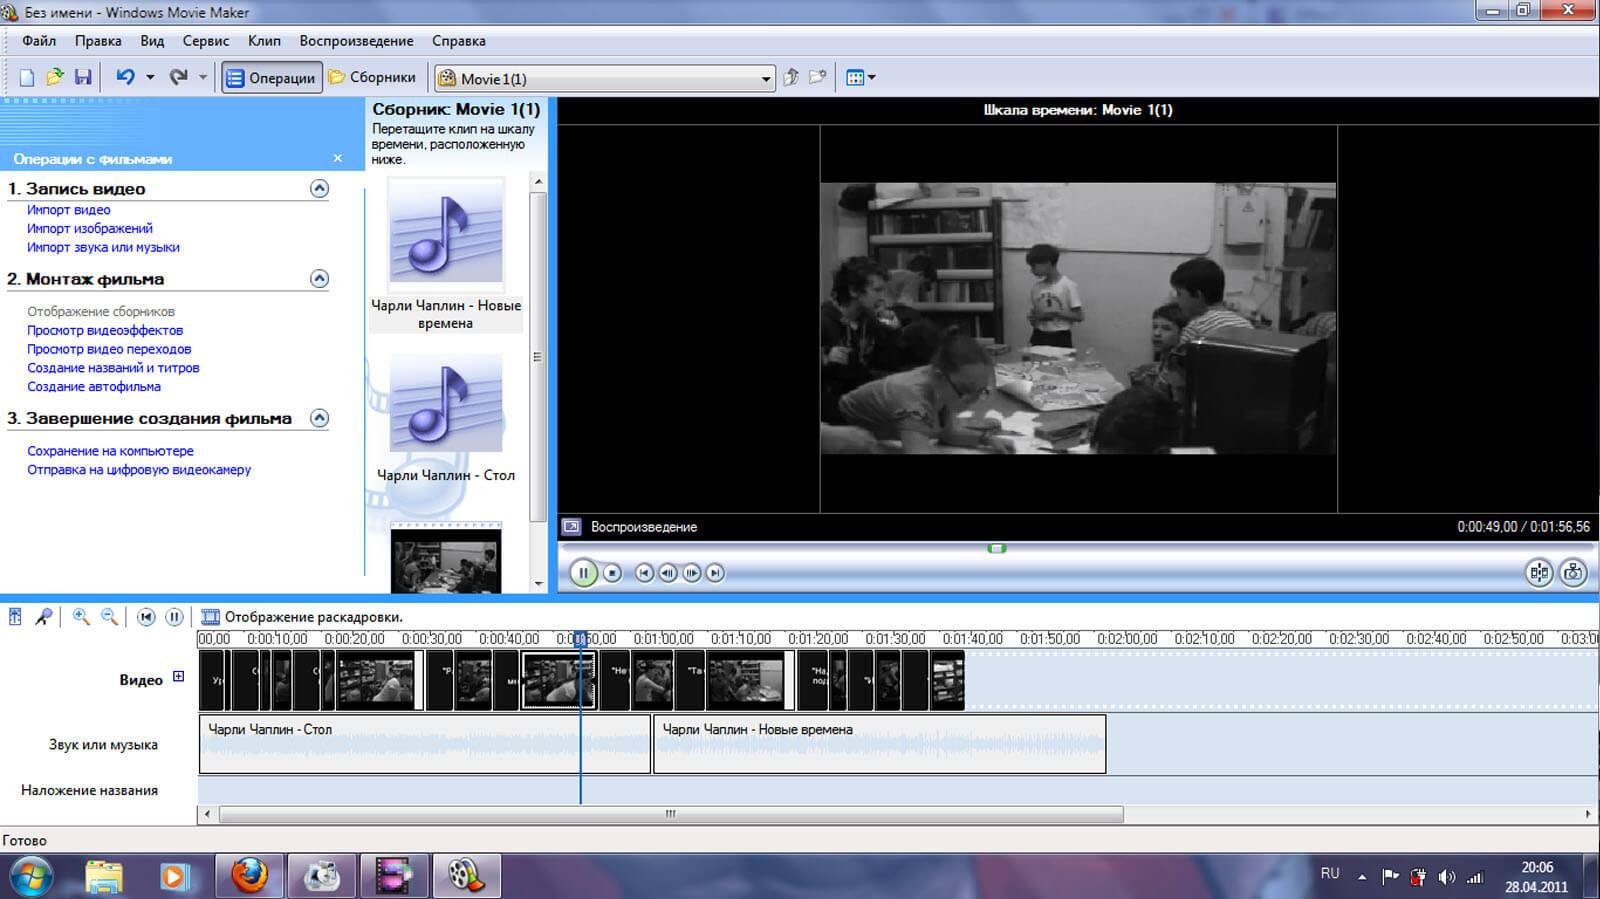 Видеоредактор Windows